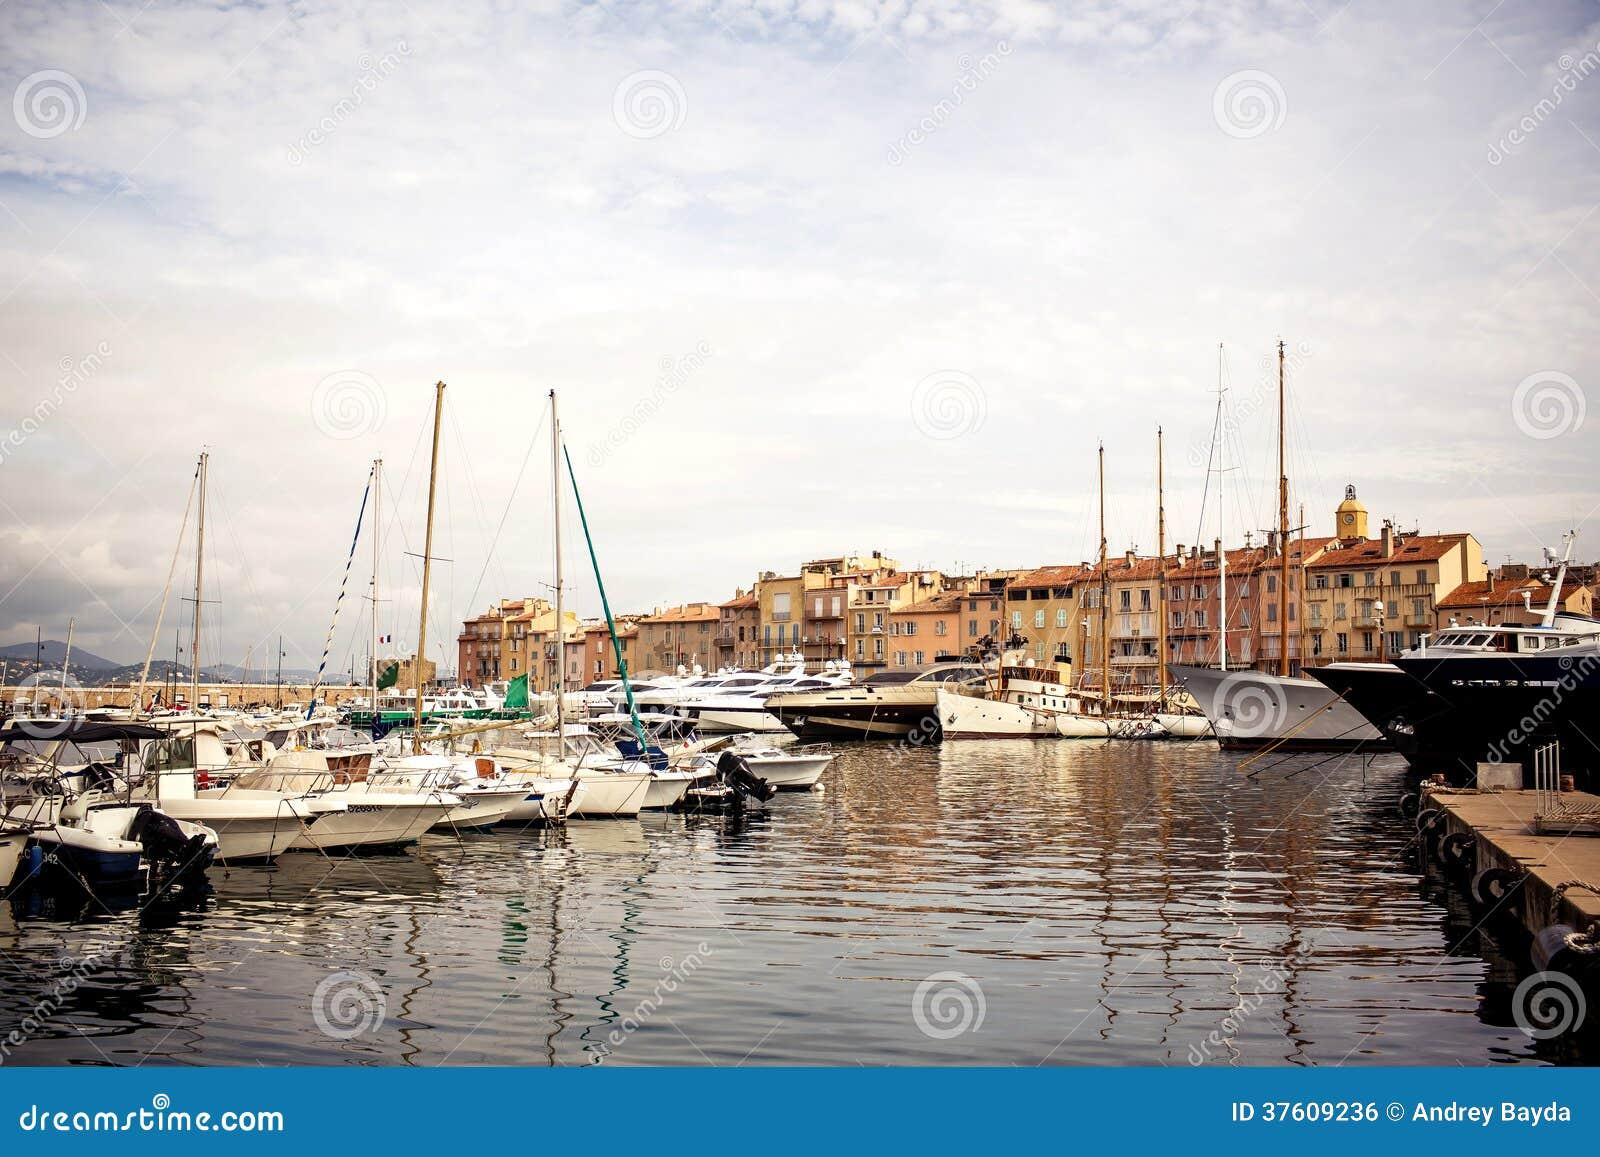 Saint Tropez Port France Stock Photo Image Of Blue 37609236